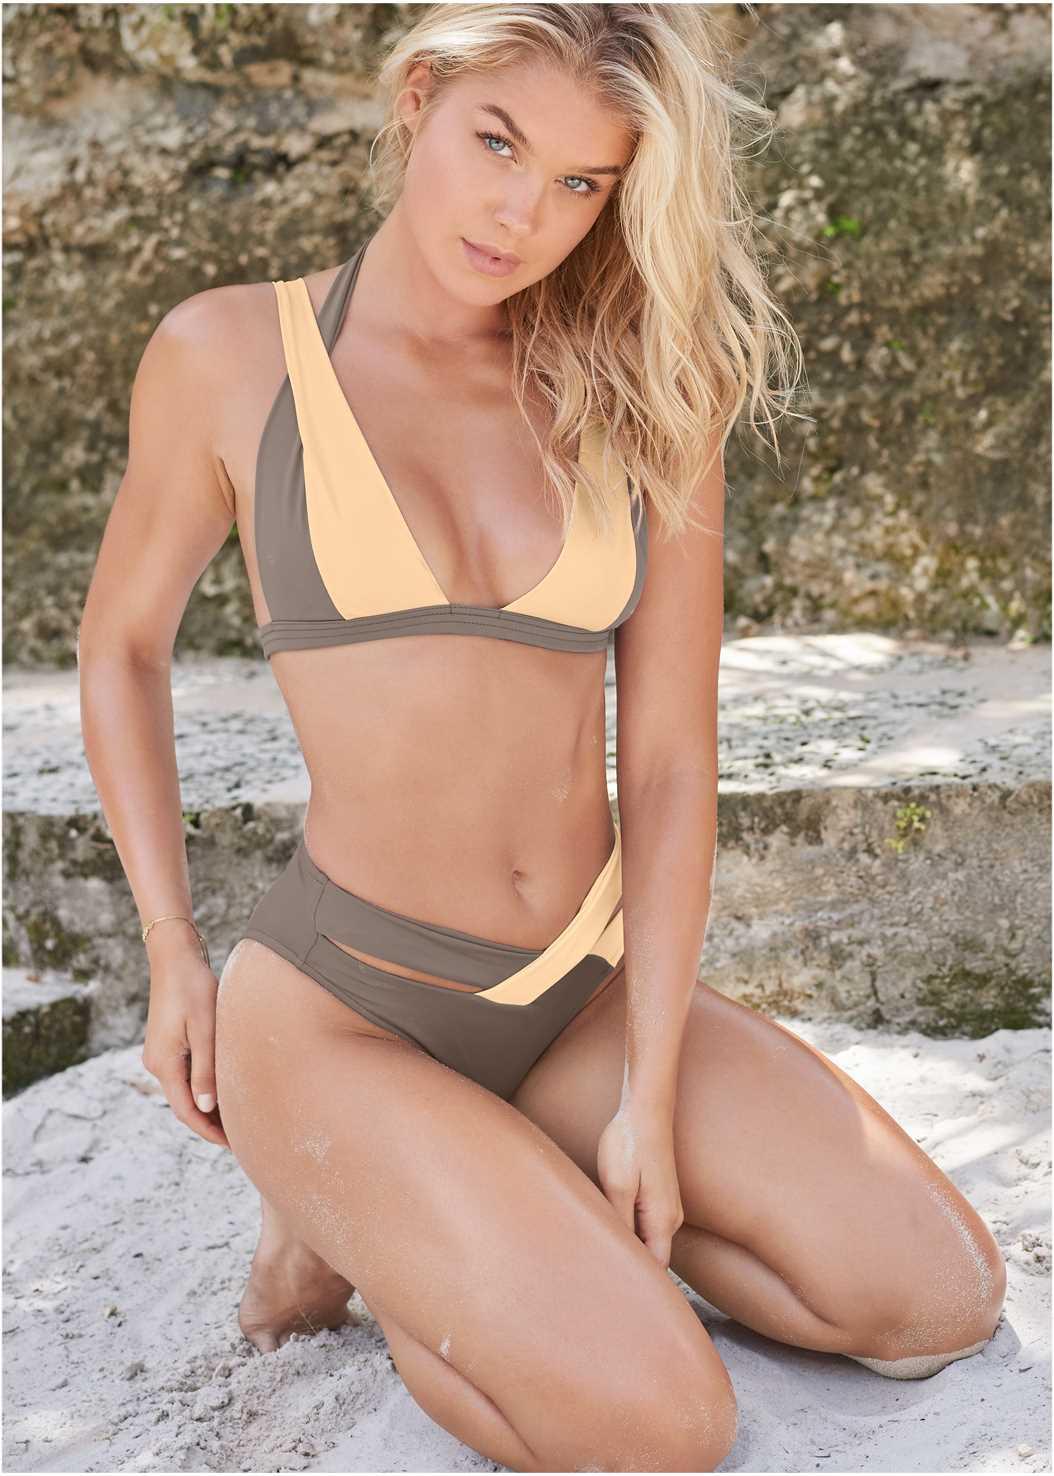 Sports Illustrated Swim™ Brazilian Bralette Top,Sports Illustrated Swim™ Brazilian Crisscross Bottom